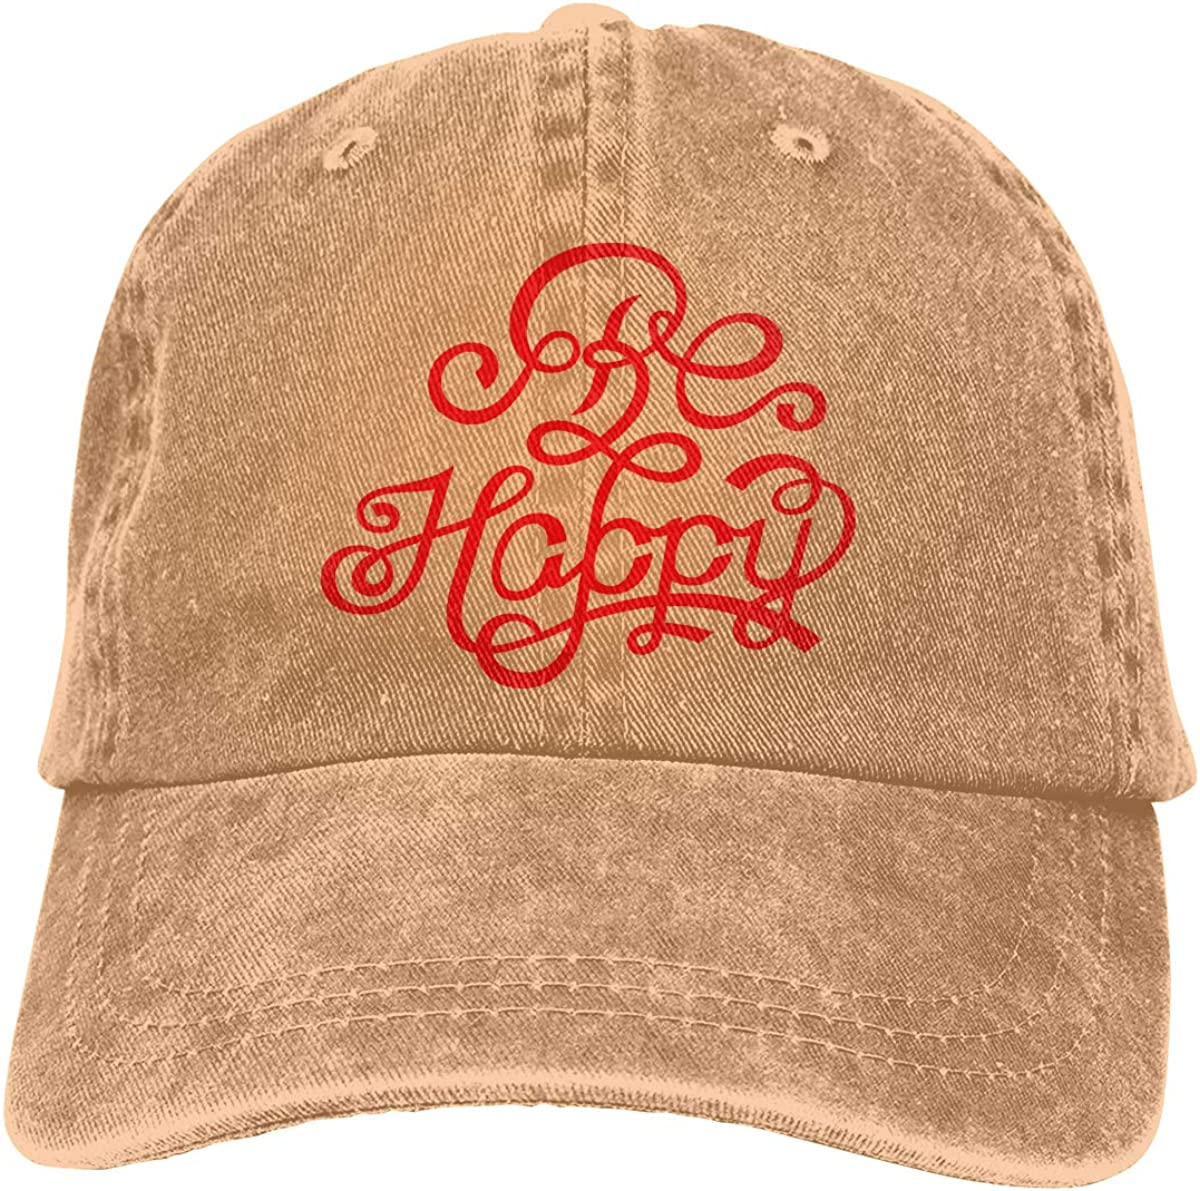 GAOFEIhat Be Happy Unisex Adult Denim Hats Cowboy Hat Dad Hat Driver Cap